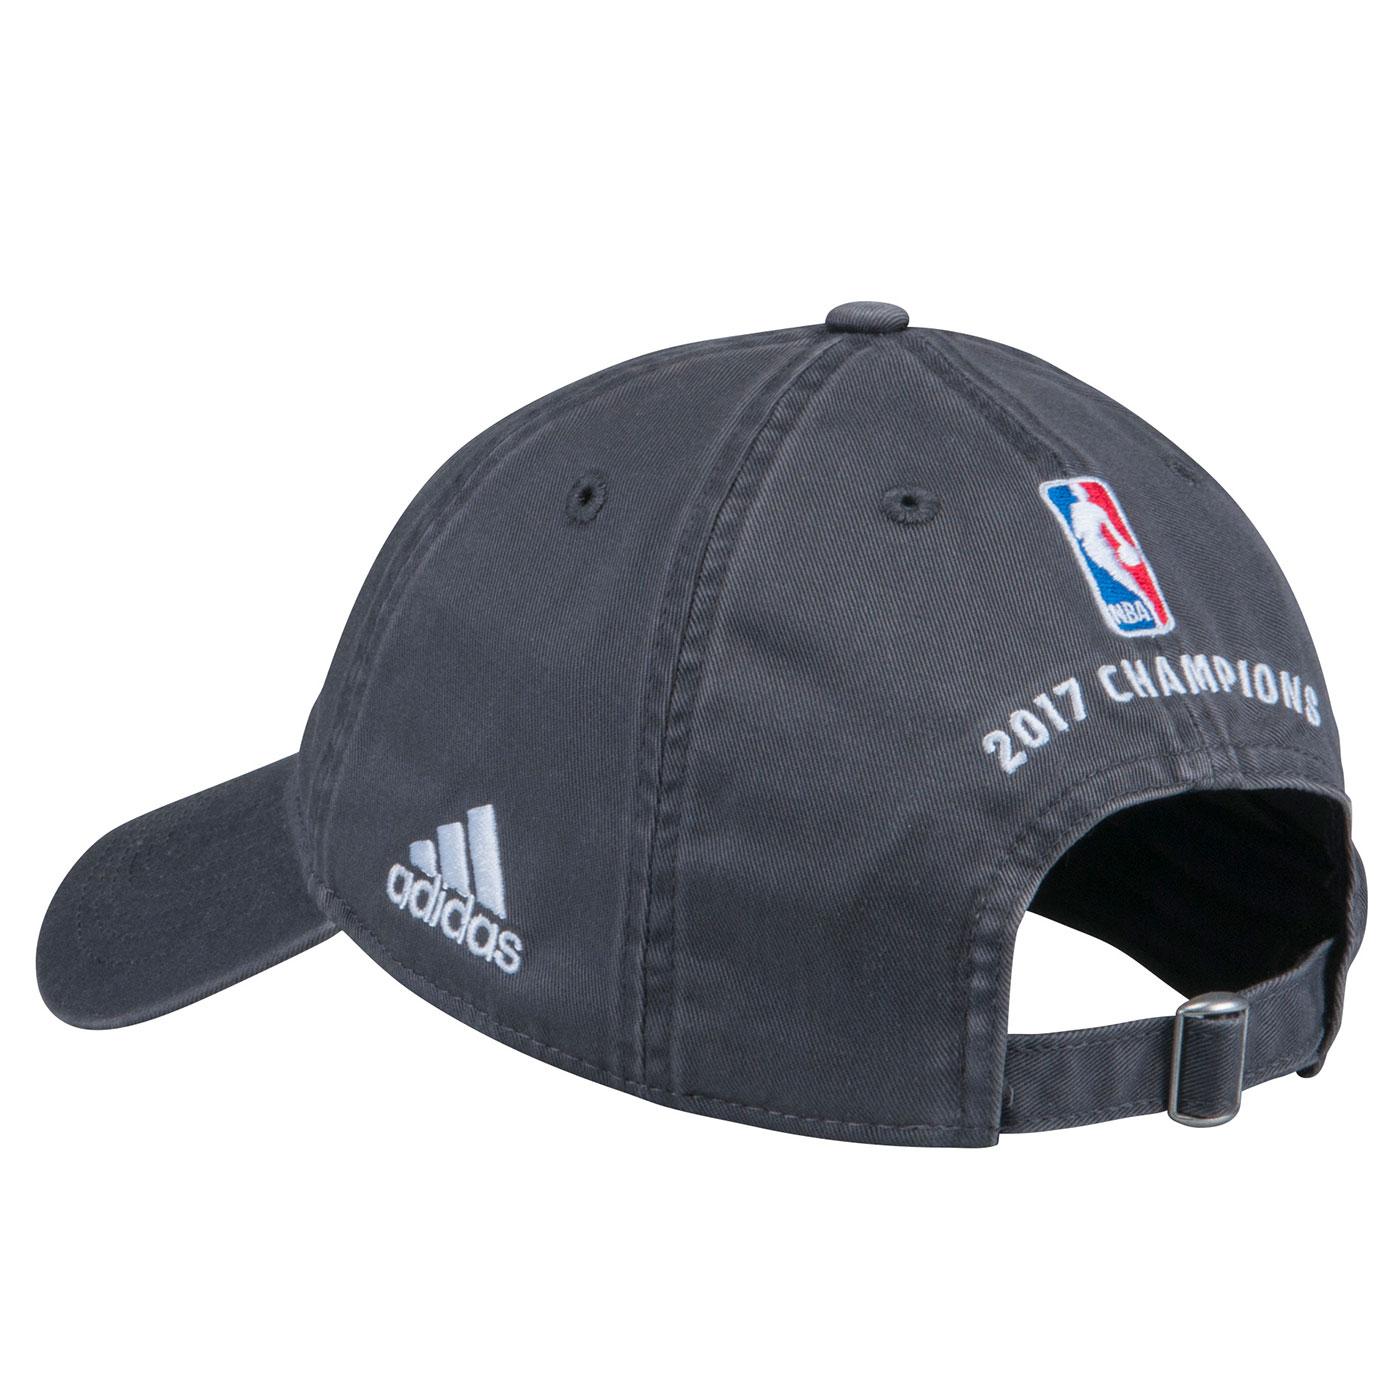 905ee9f011f8c Golden State Warriors adidas 2017 NBA Finals Champions Authentic Locker  Room Cap - Grey